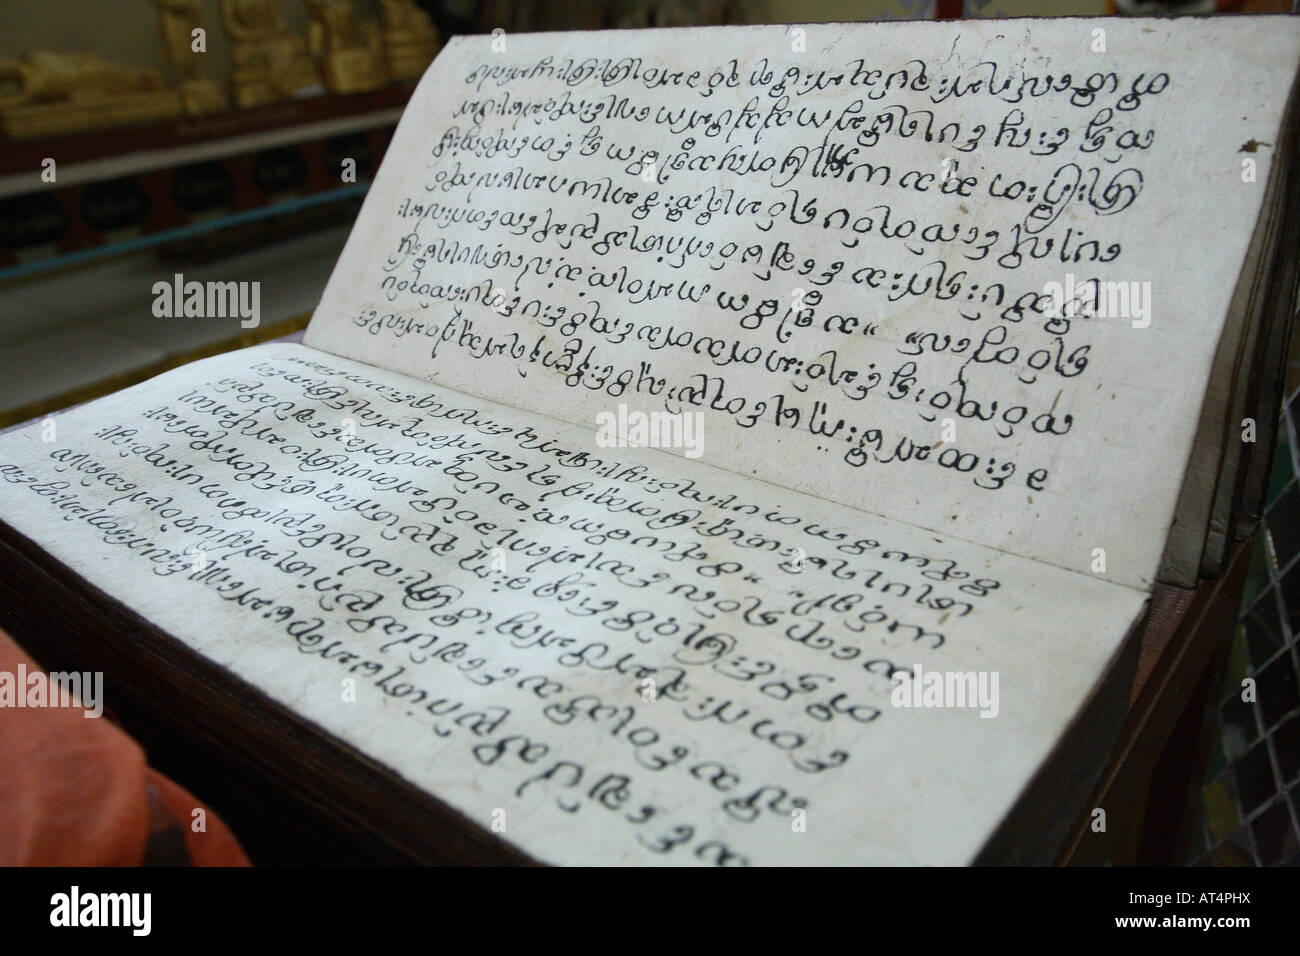 Thailand Mae Hong Son Burmese Buddhist scripture - Stock Image